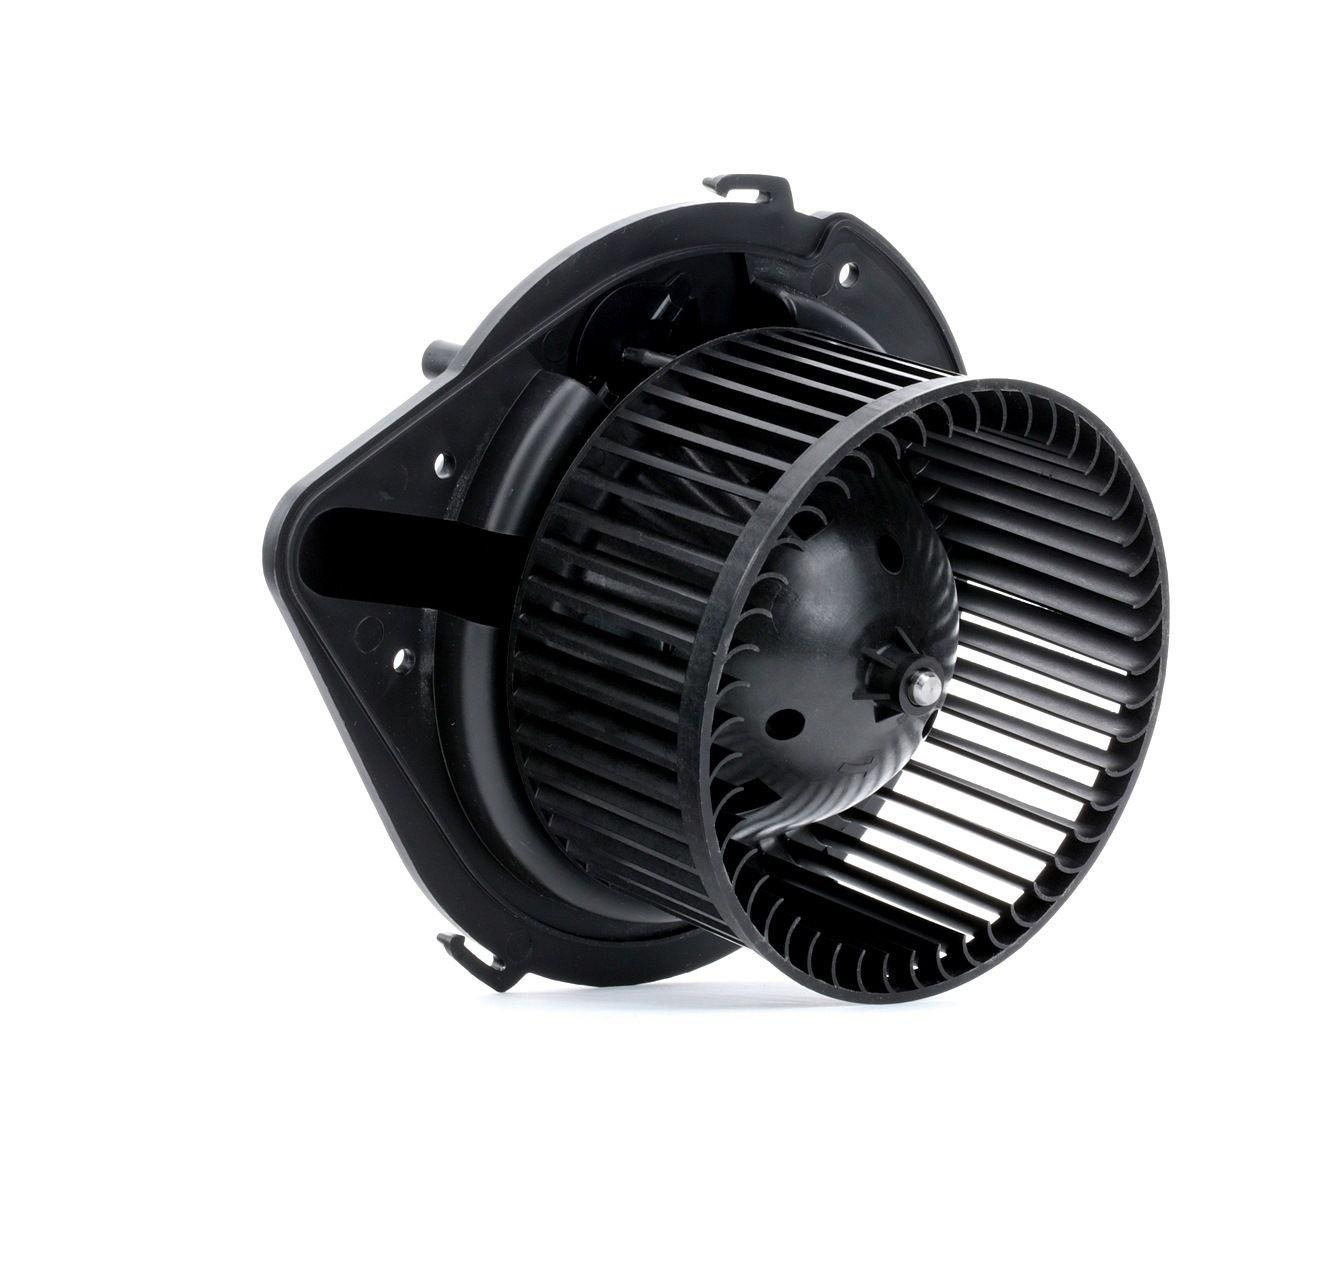 RIDEX: Original Innenraumgebläse 2669I0019 (Spannung: 12V, Nennleistung: 192W)